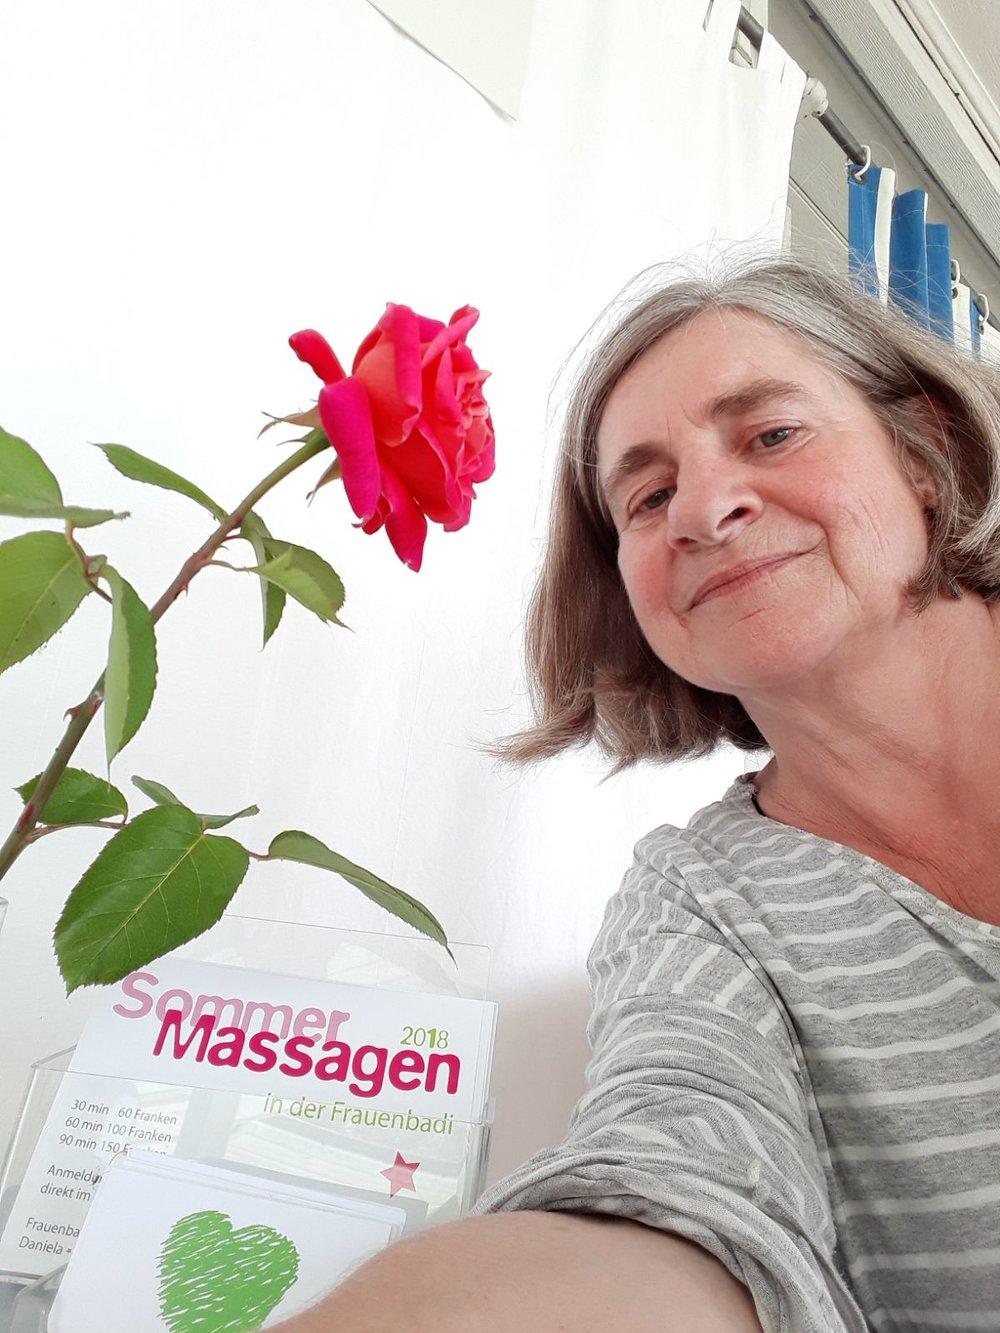 Denise  lasdenissas@bluewin.ch   www.sternum.ch